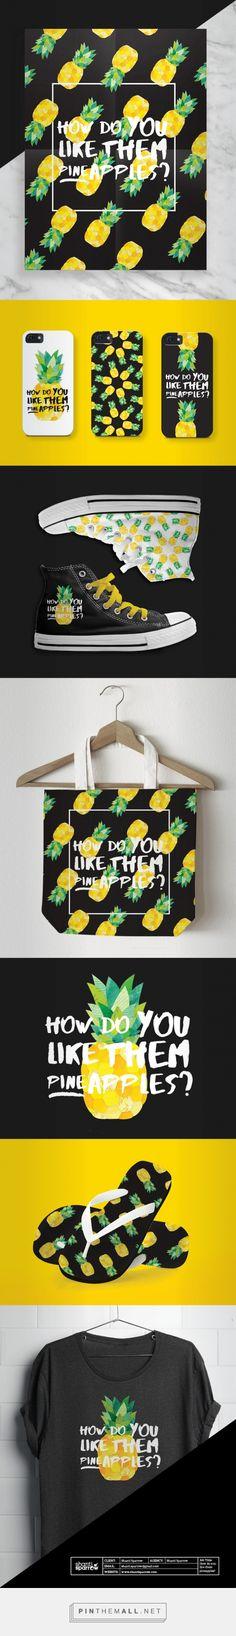 How Do You Like Them Pineapples Branding by Shanti Sparrow   Fivestar Branding Agency – Design and Branding Agency & Inspiration Gallery